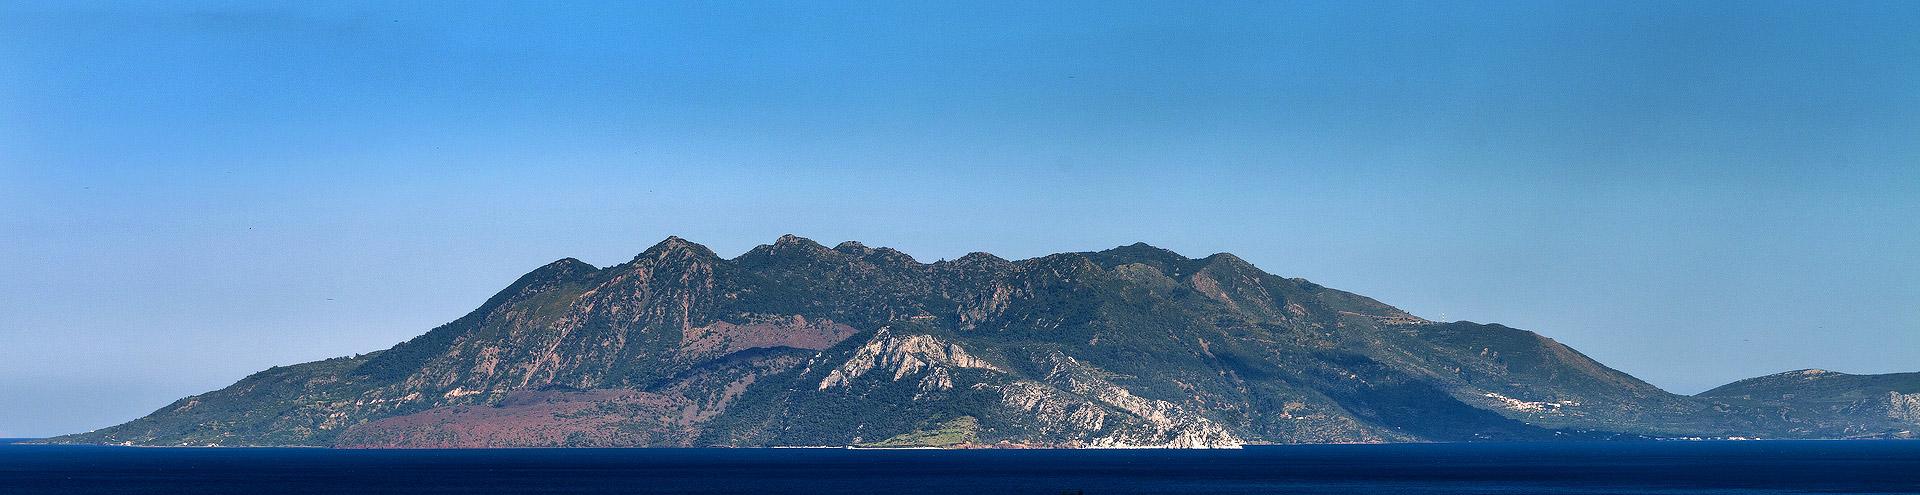 Vulkanhalbinsel von Palia Epidavros fotografiert